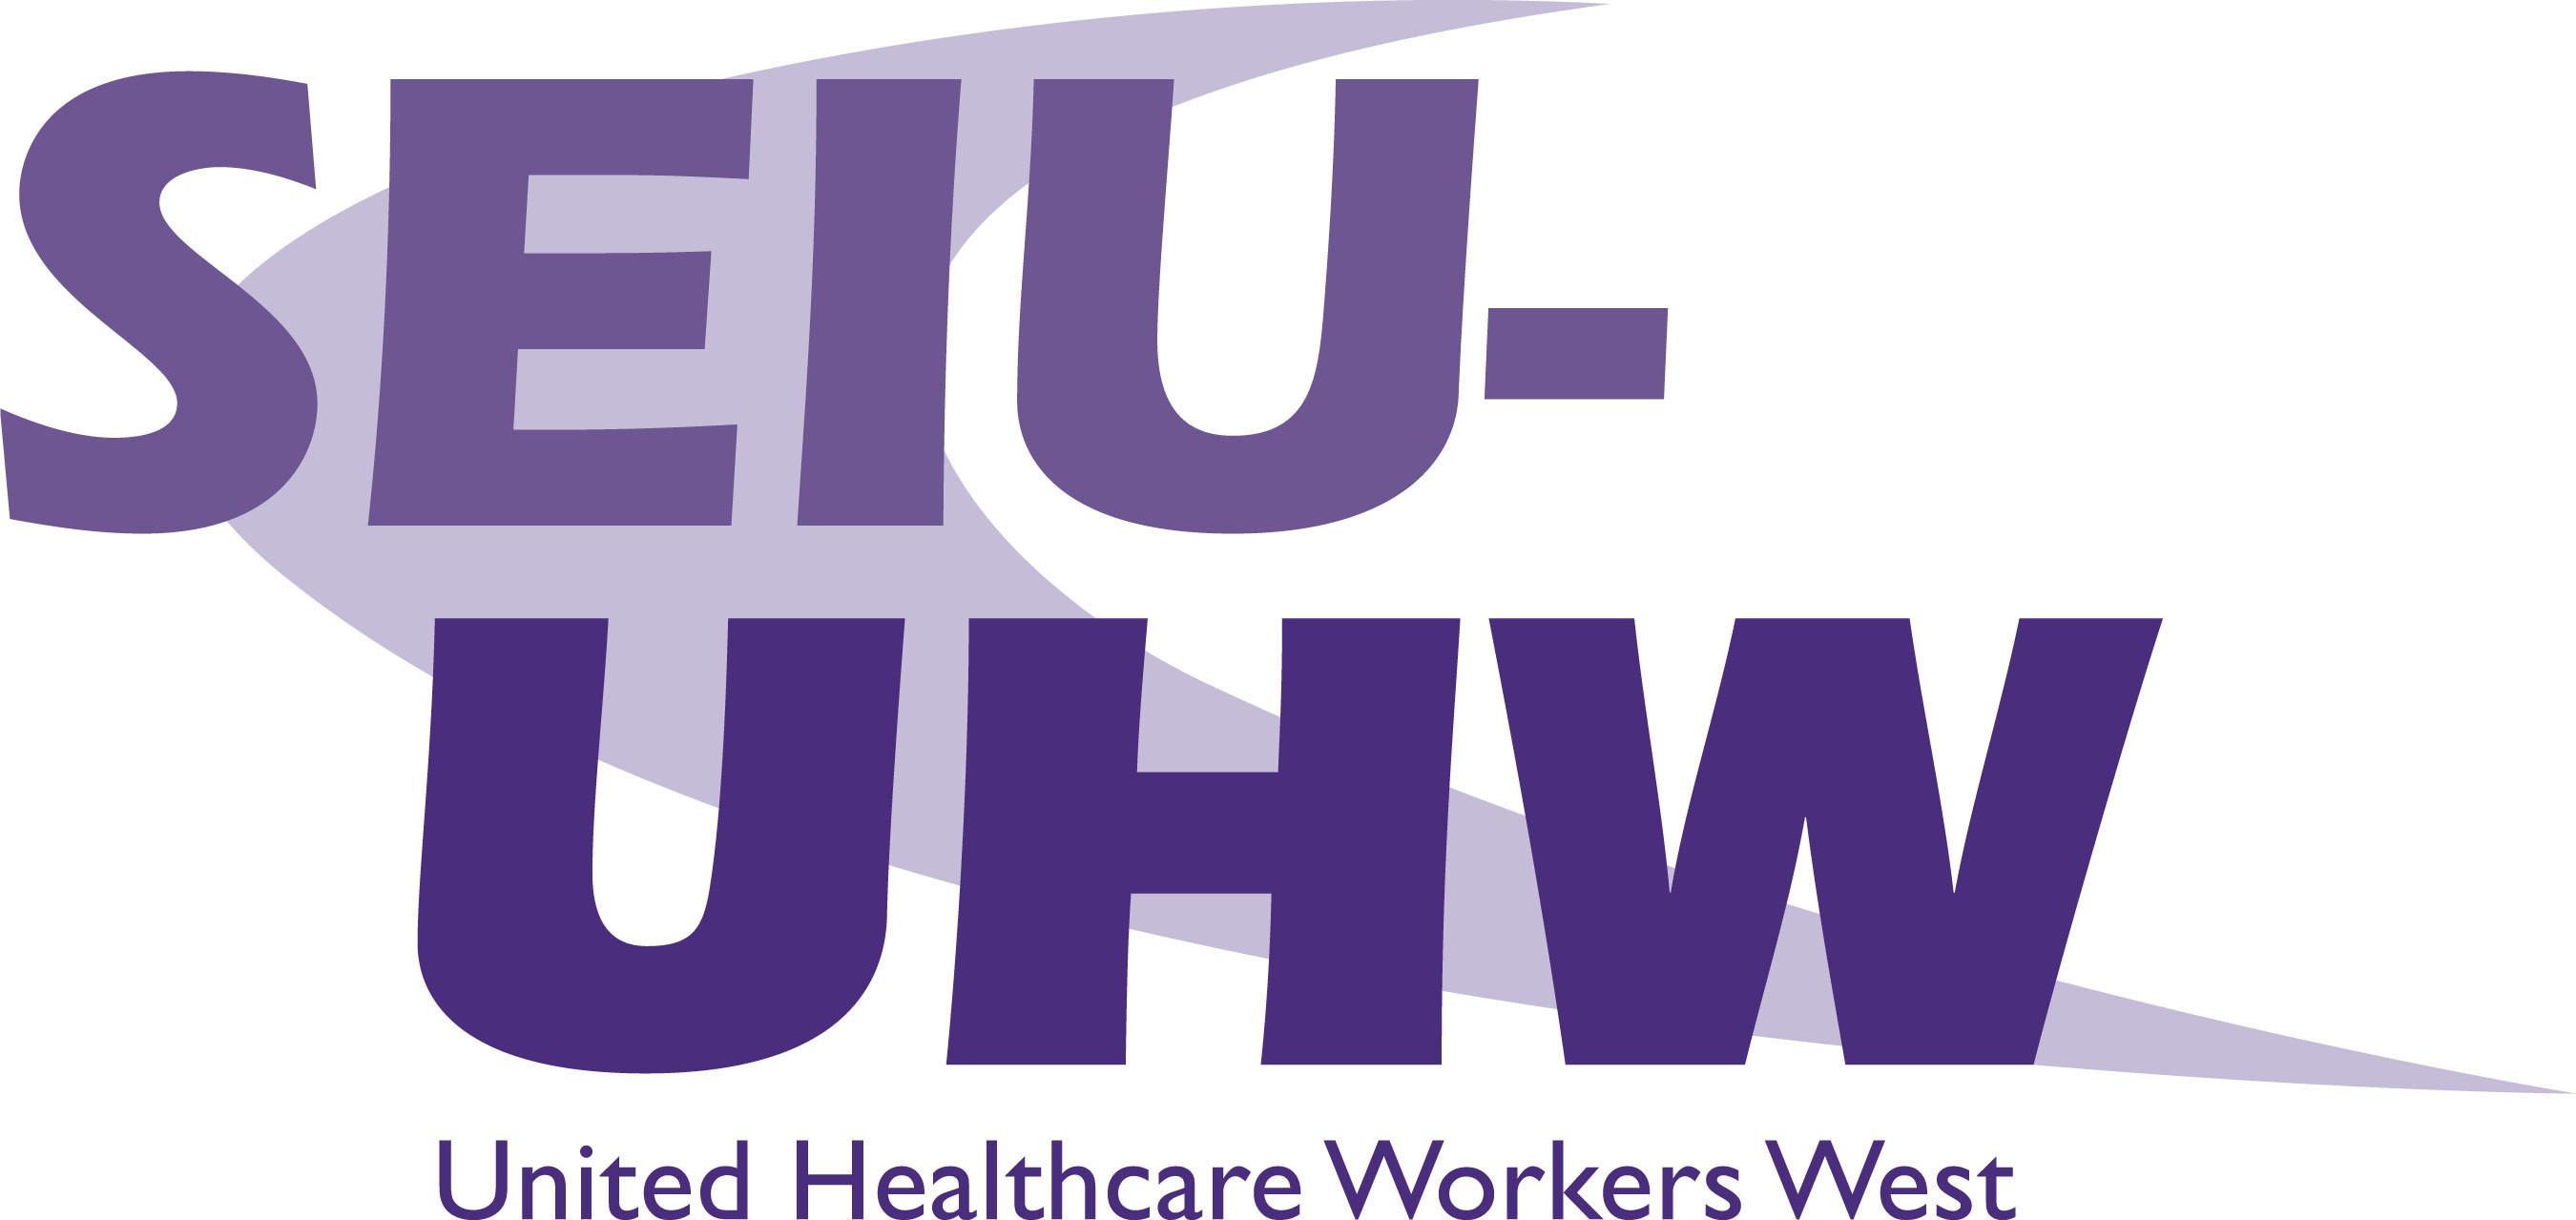 SEIU-United Healthcare Workers West logo. (PRNewsFoto/SEIU United Healthcare Workers)